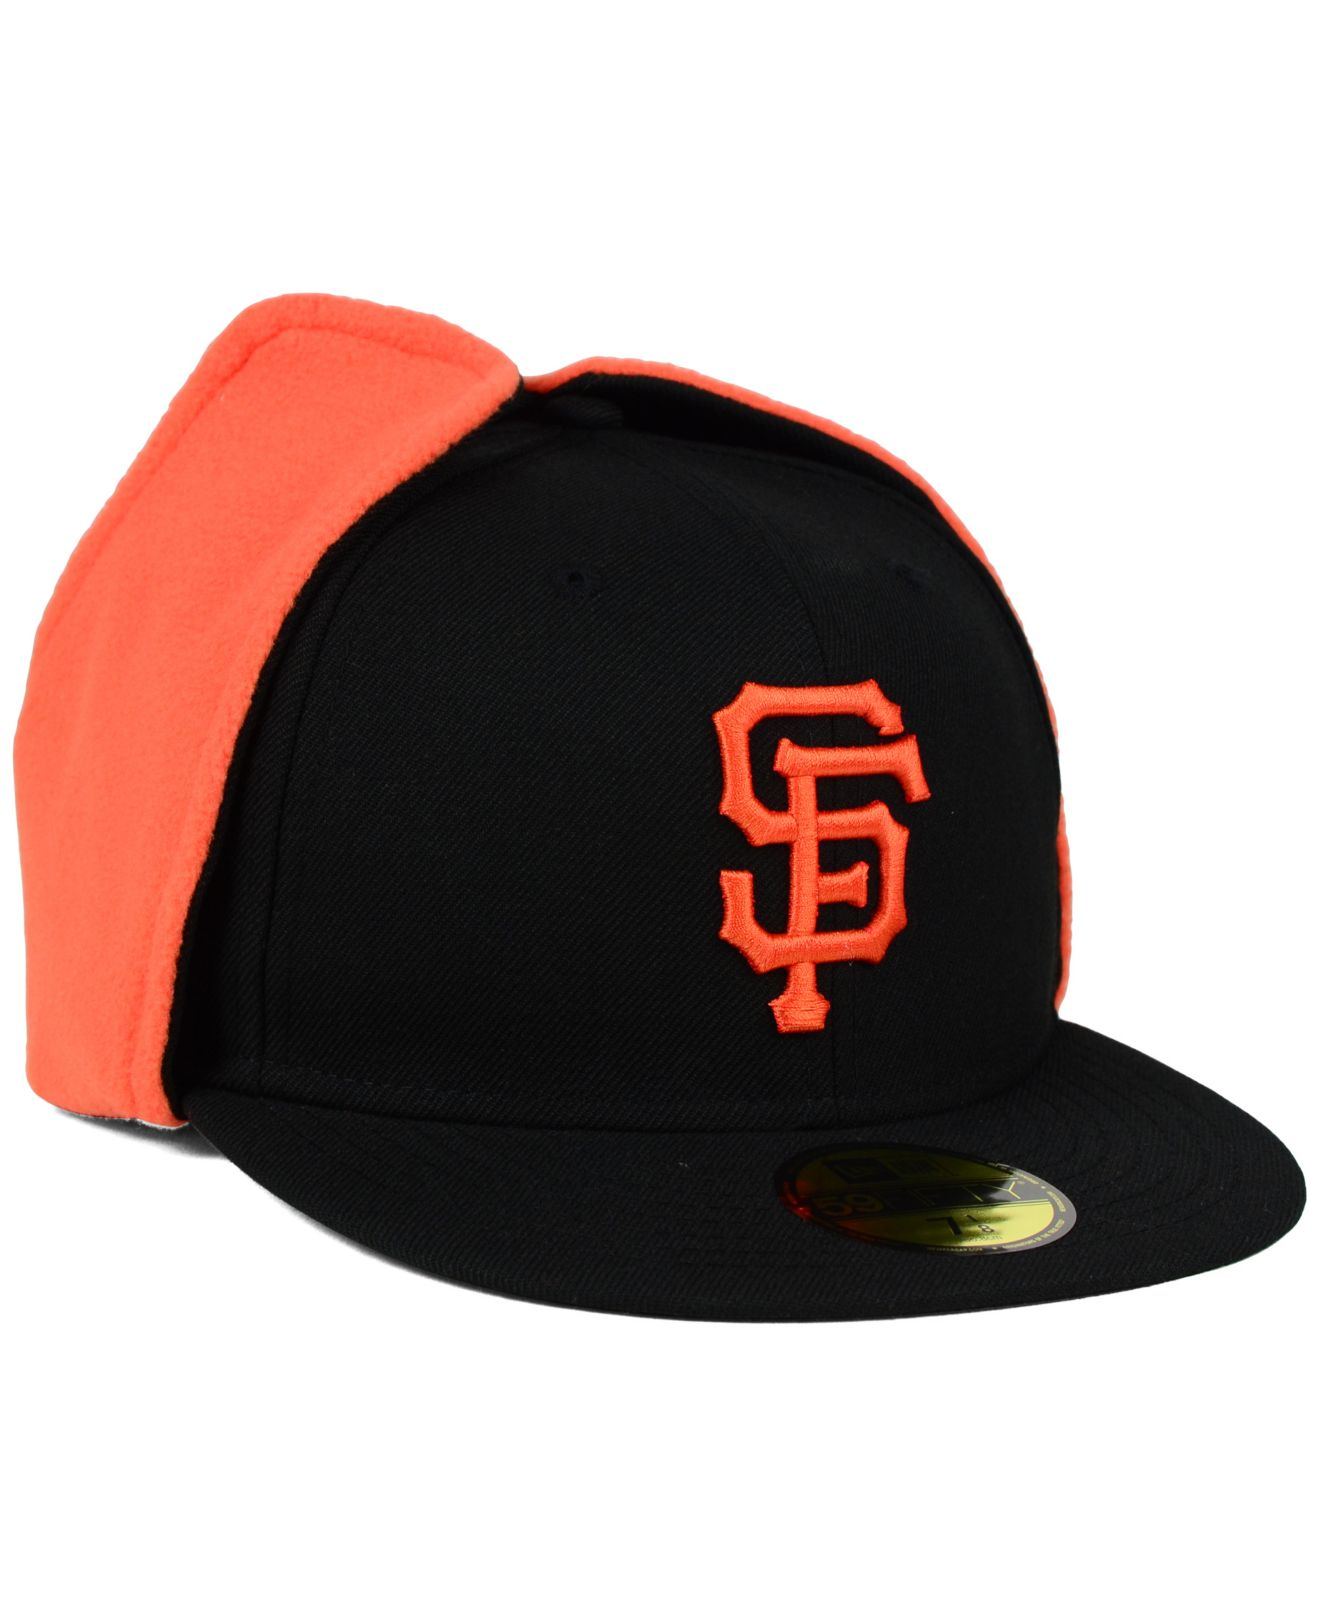 8941b131f95 Lyst - KTZ San Francisco Giants Dog Ear 59fifty Cap in Black for Men